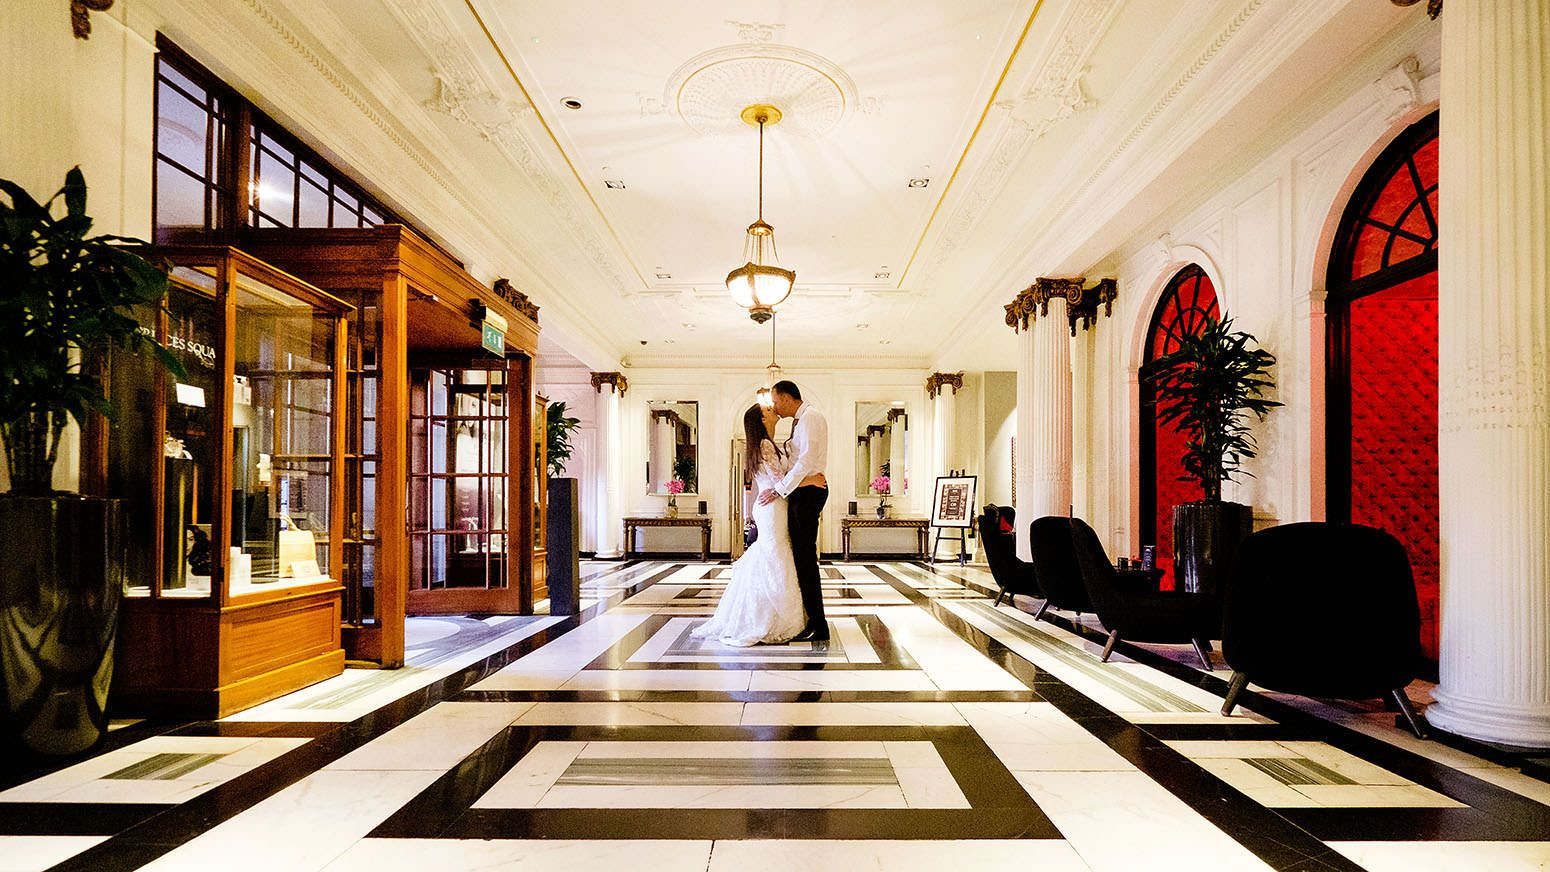 wedding photography in Glagow by Ian Arthur Wedding Photography